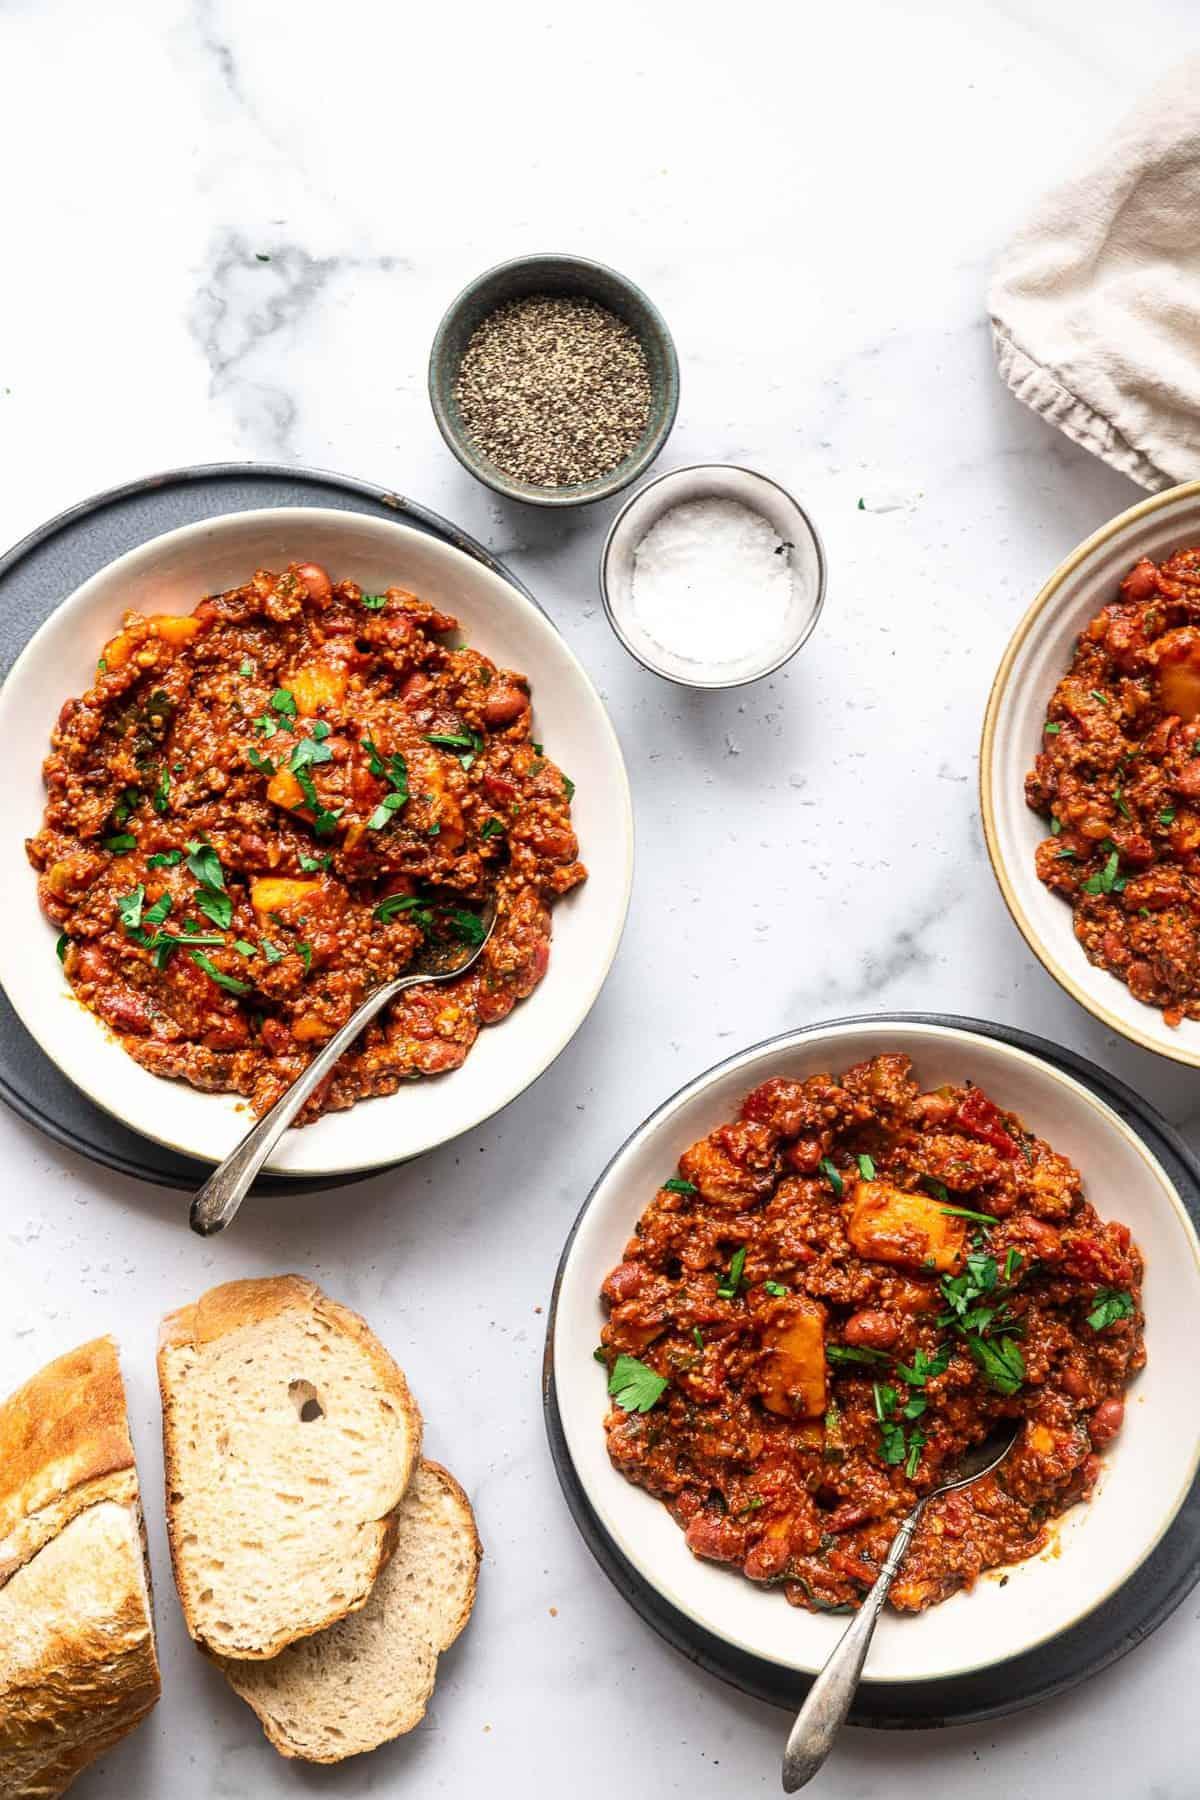 2 bowls of turkey sweet potato chili with crusty bread